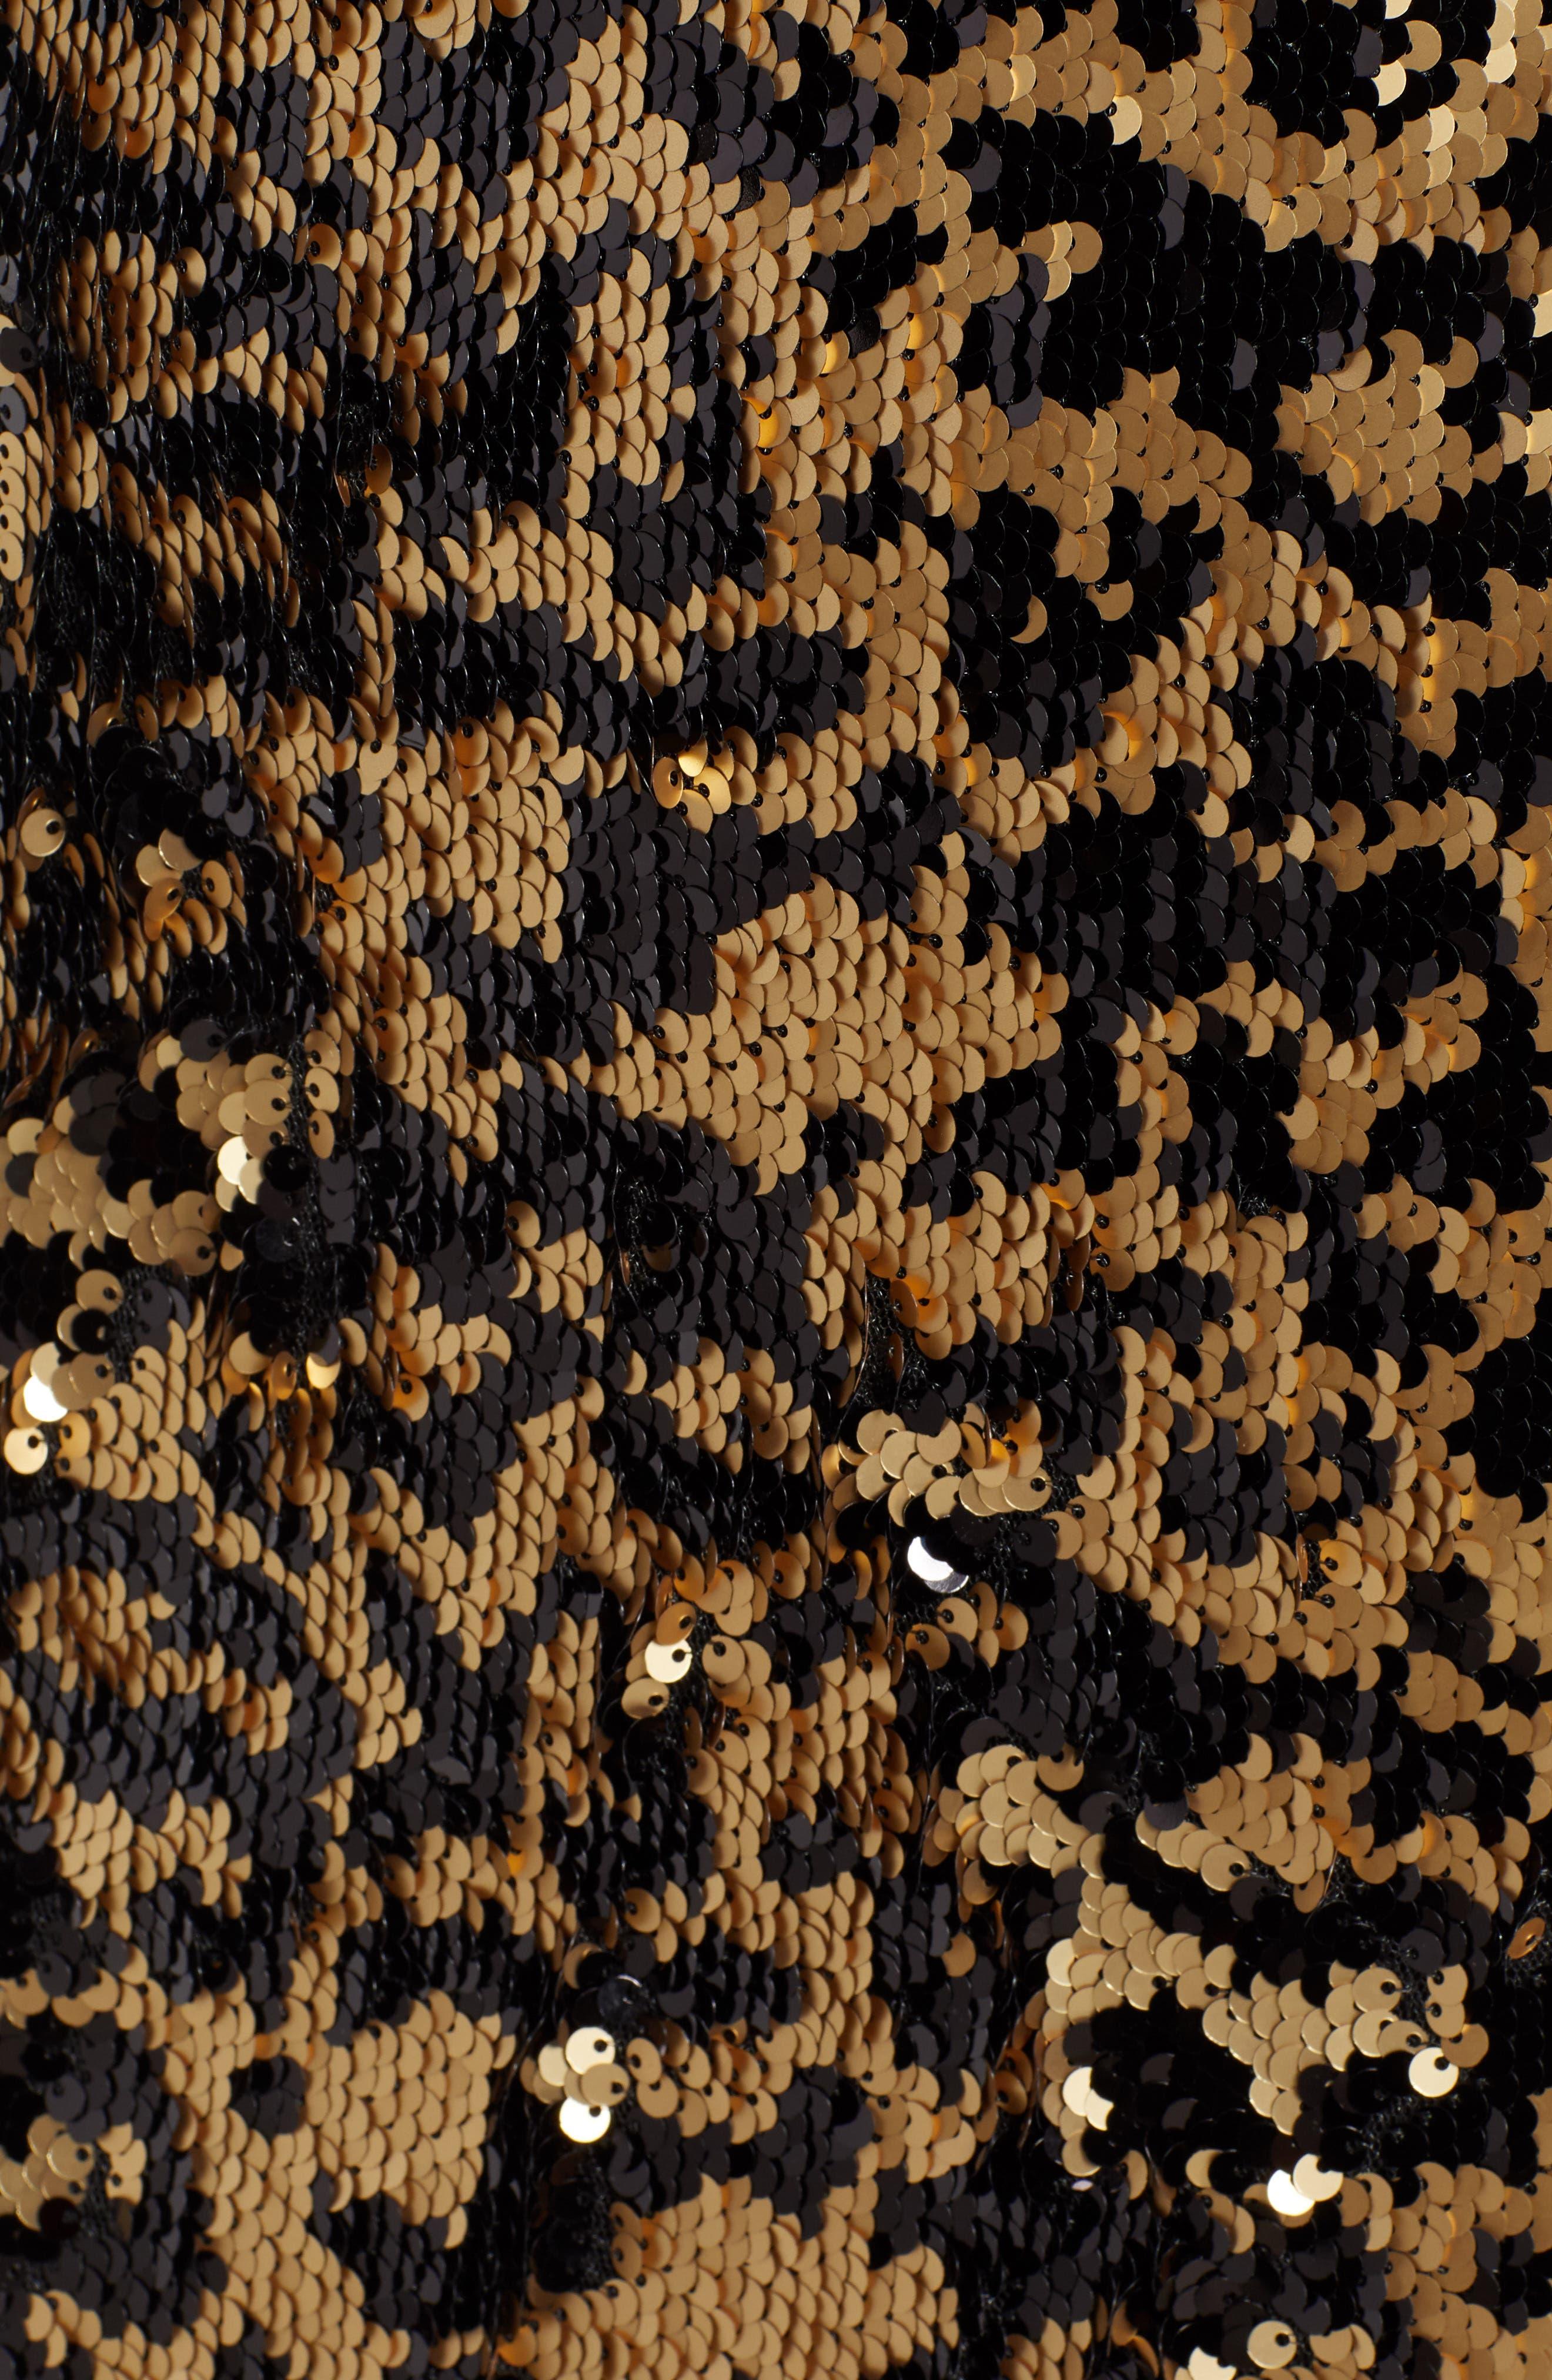 Leopard Sequin Dress,                             Alternate thumbnail 6, color,                             BLACK MULTI